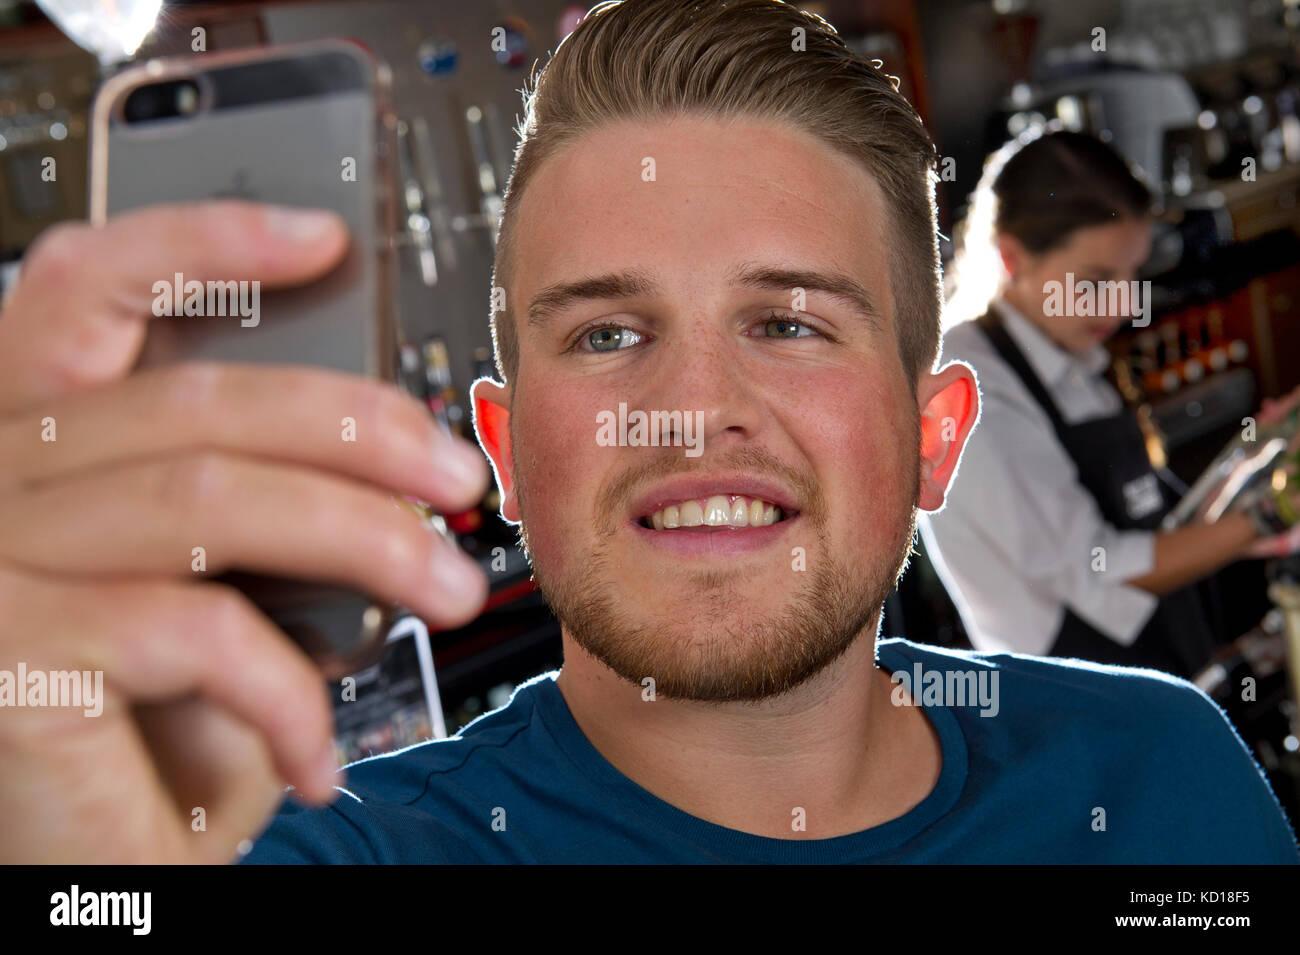 Ben Phillips, prankster, youtuber, social media celebrity Stock Photo